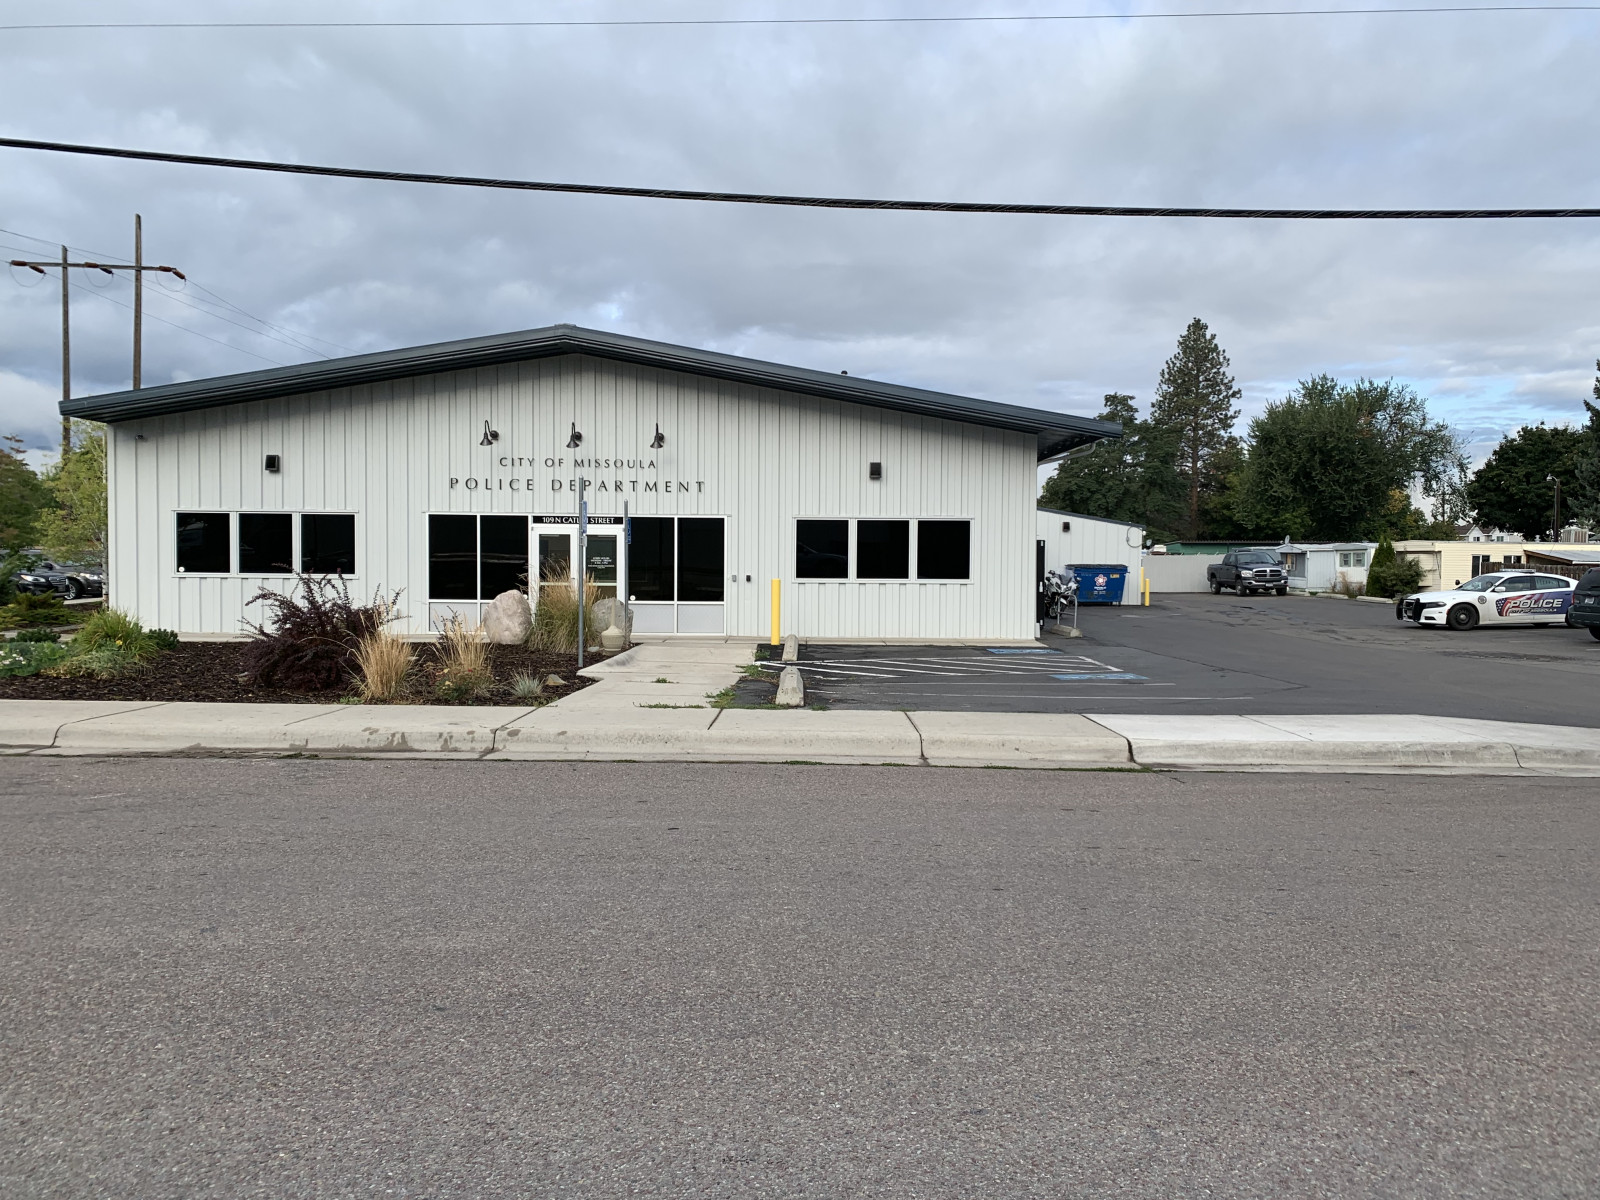 Police Facility